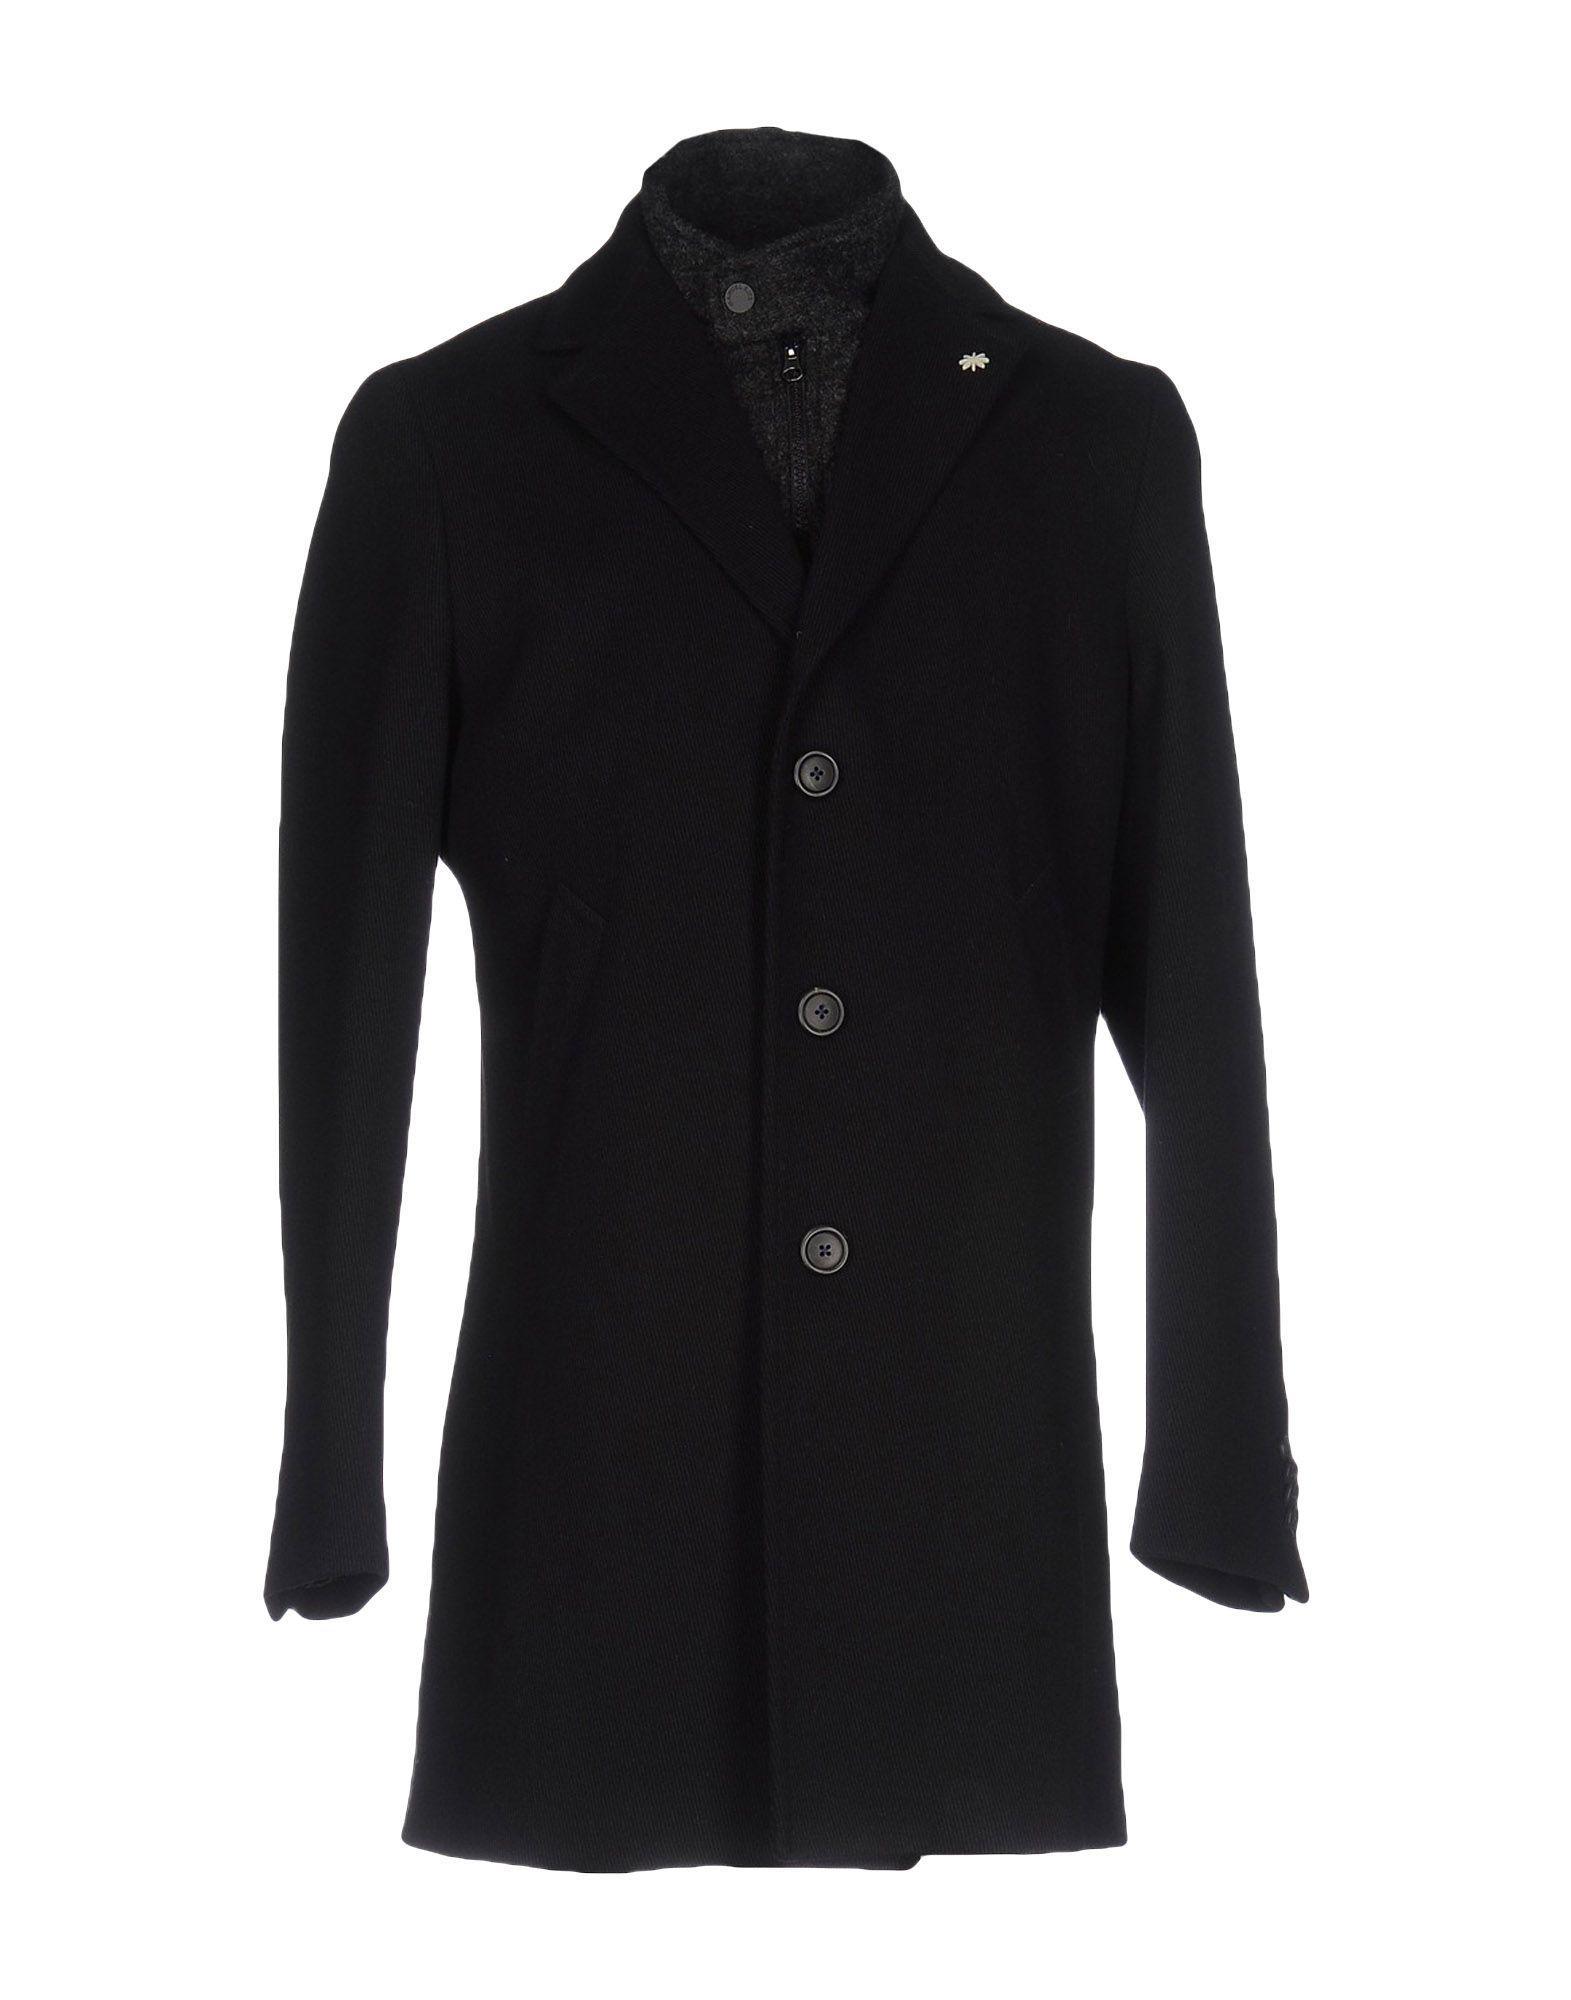 Manuel Ritz Coats In Black